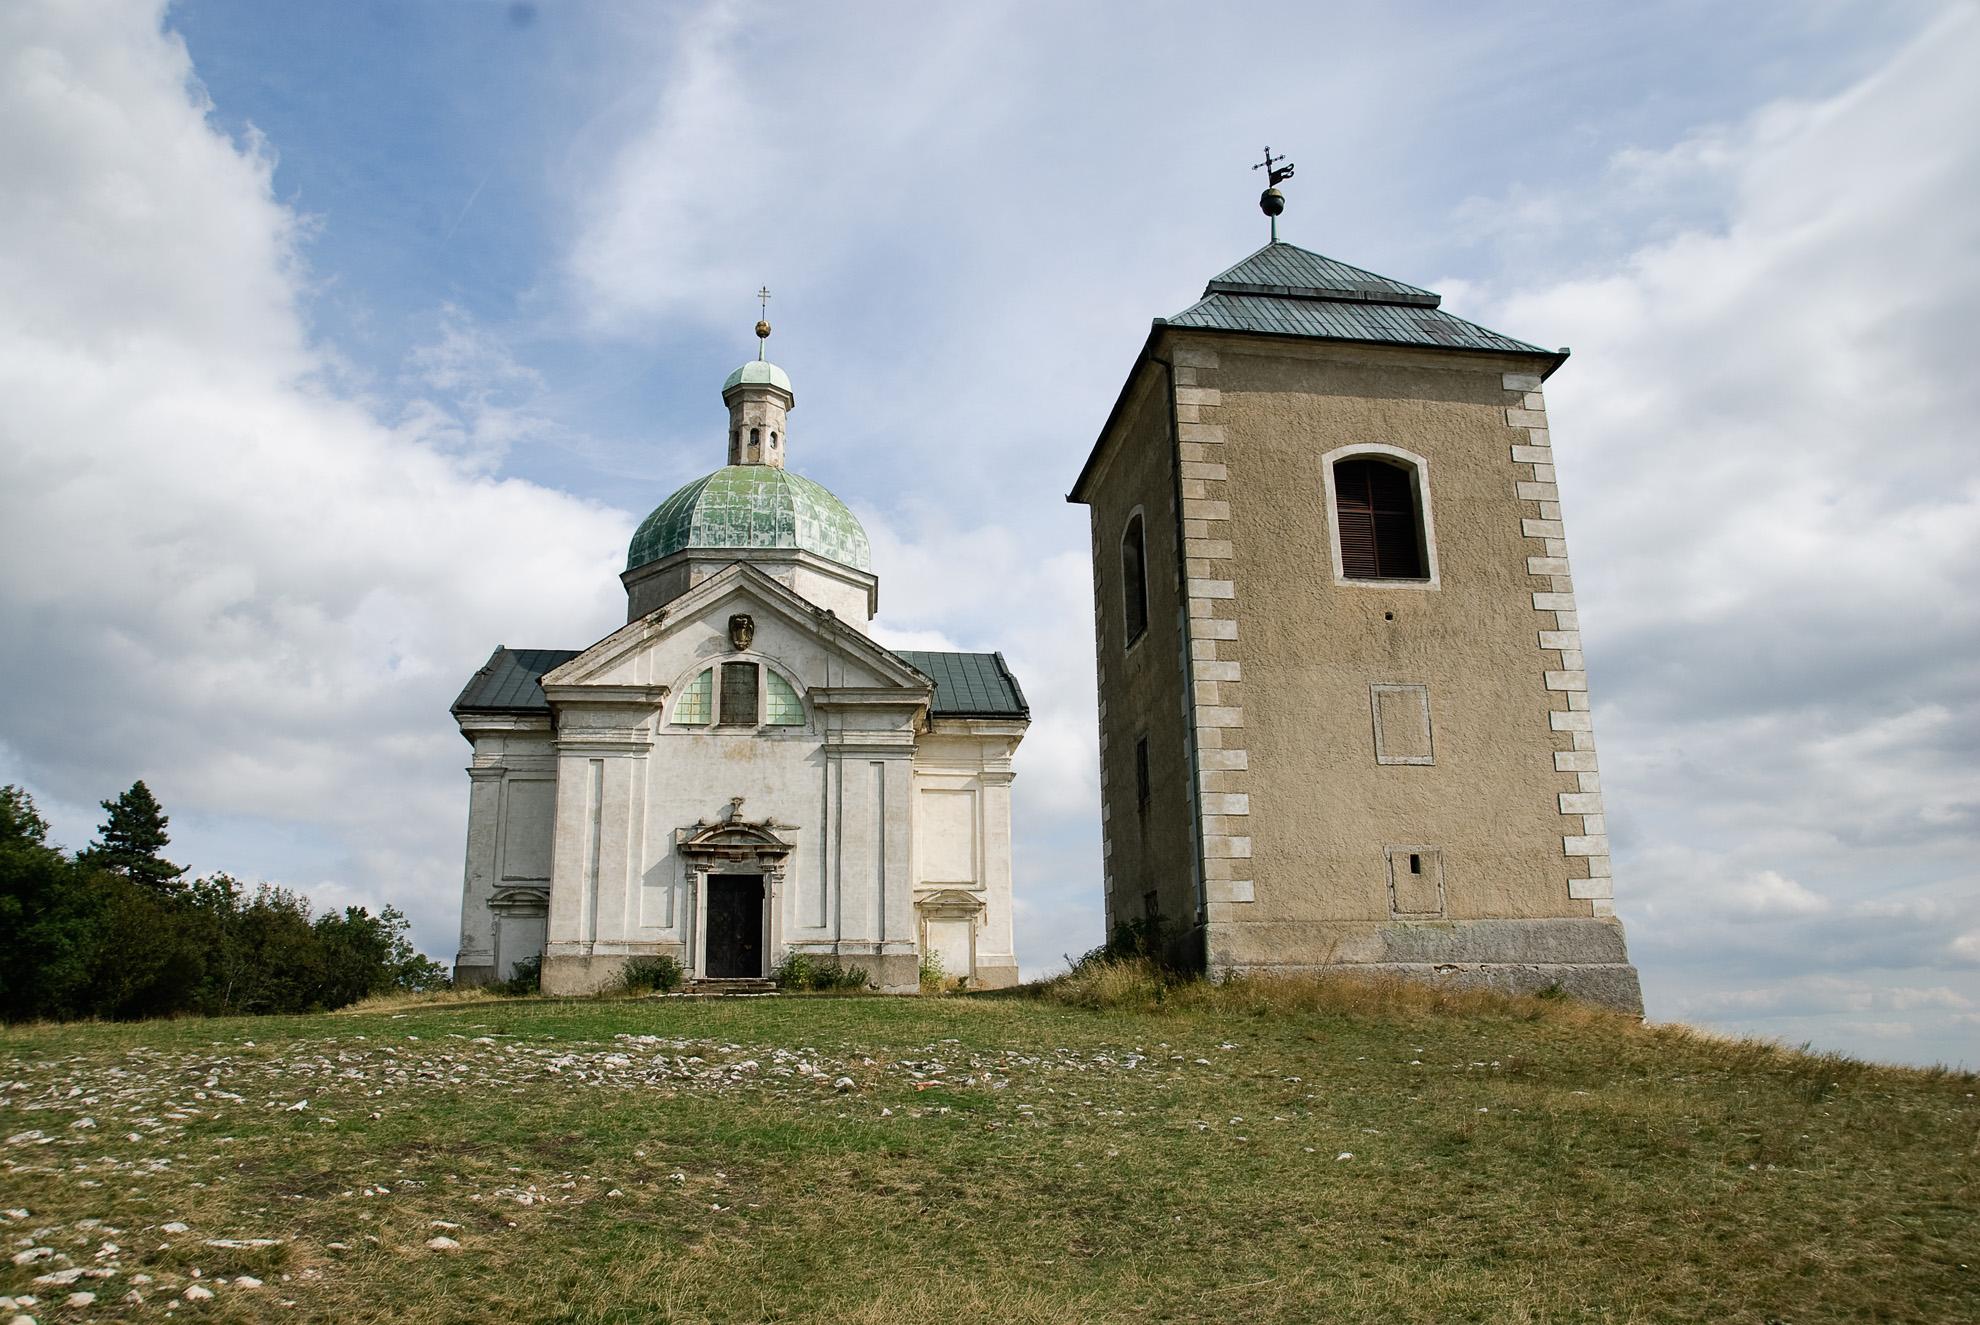 Sanktuarium świętego Sebastiana w Mikulovie